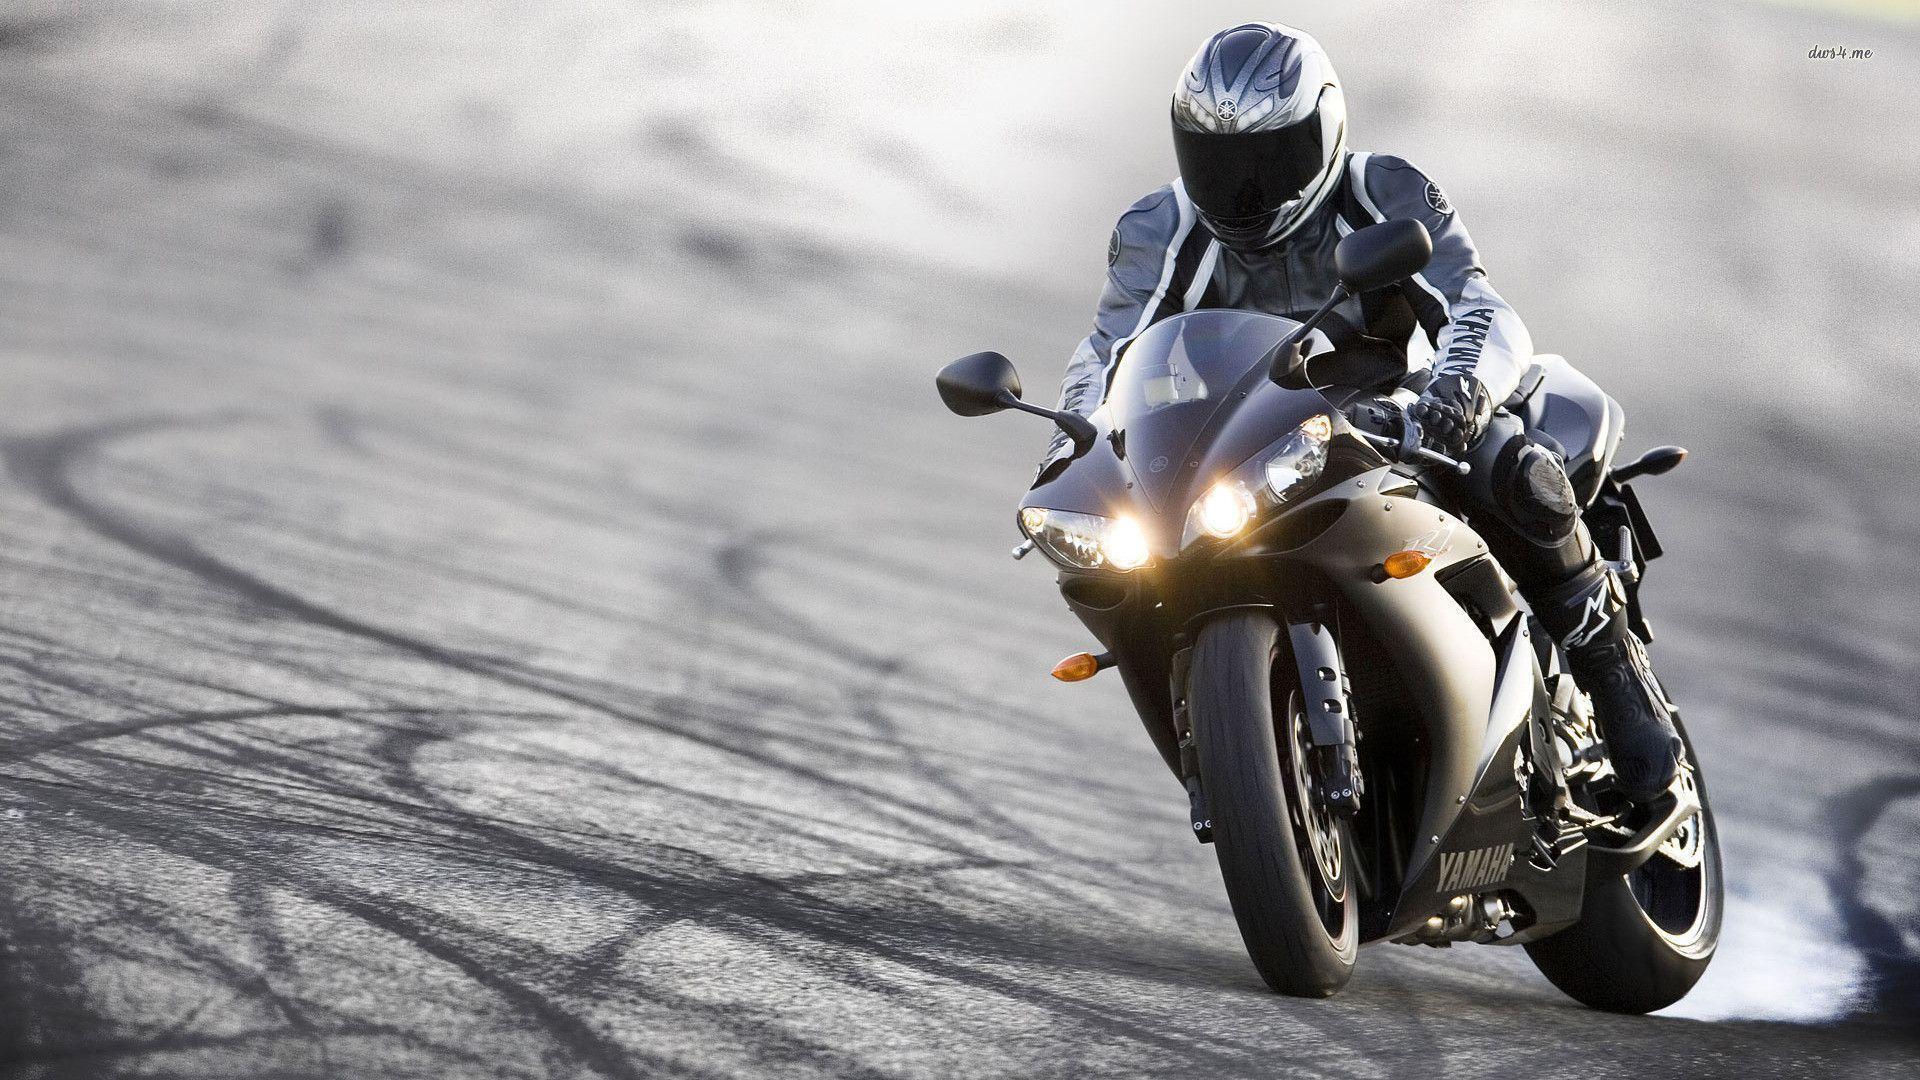 Motorcycle Wallpapers Free Download 4064 Full HD Wallpaper Desktop .